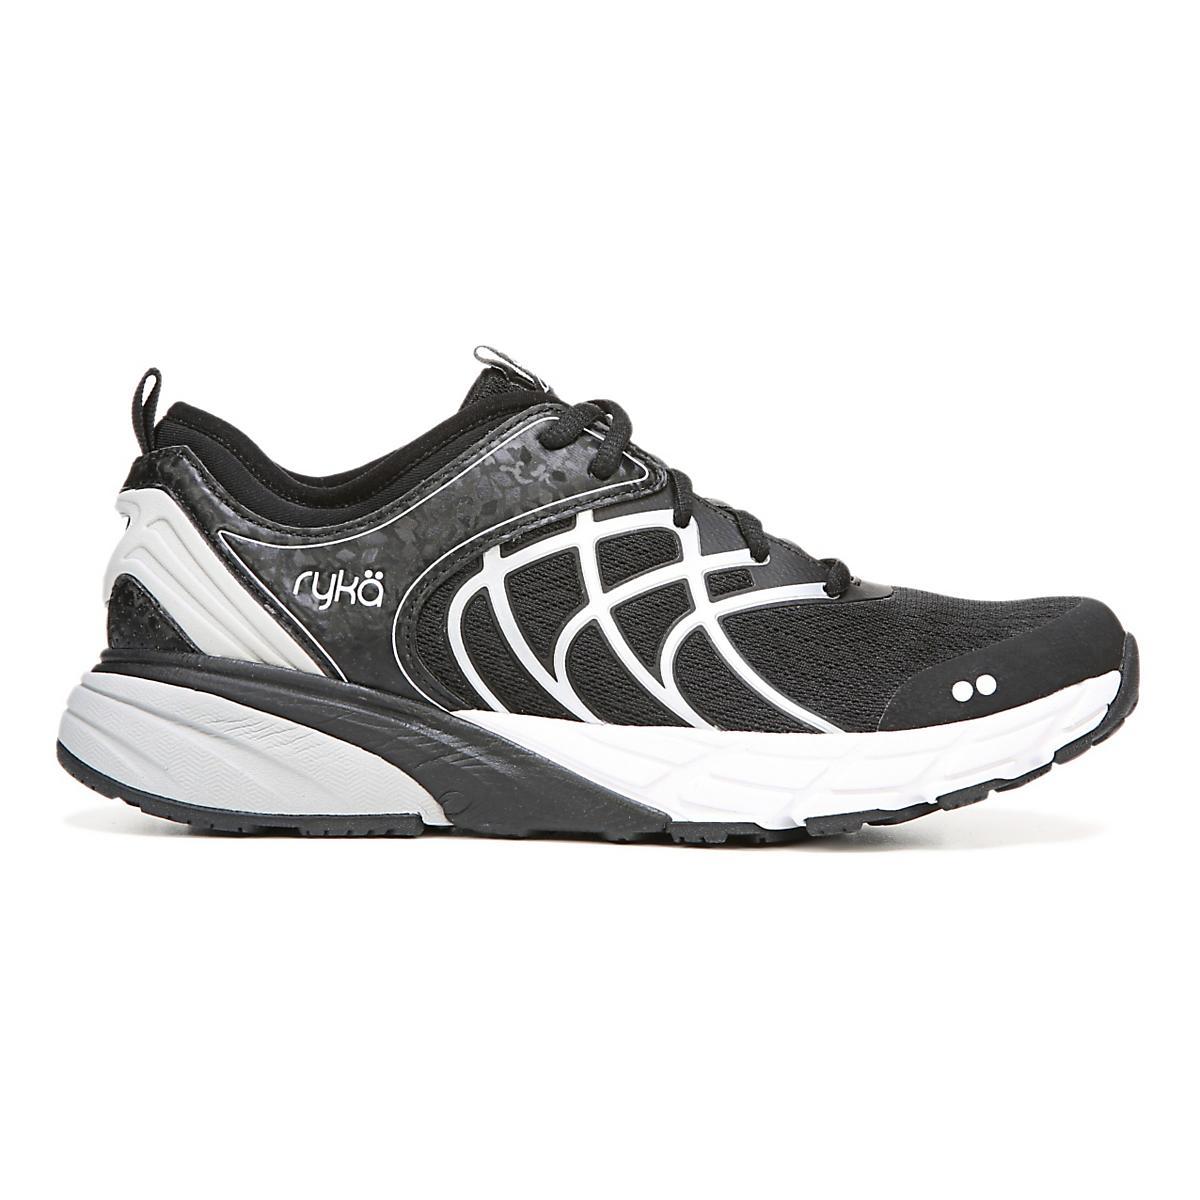 Womens Asics Gt 2000 2 Running Shoe At Road Runner Sports